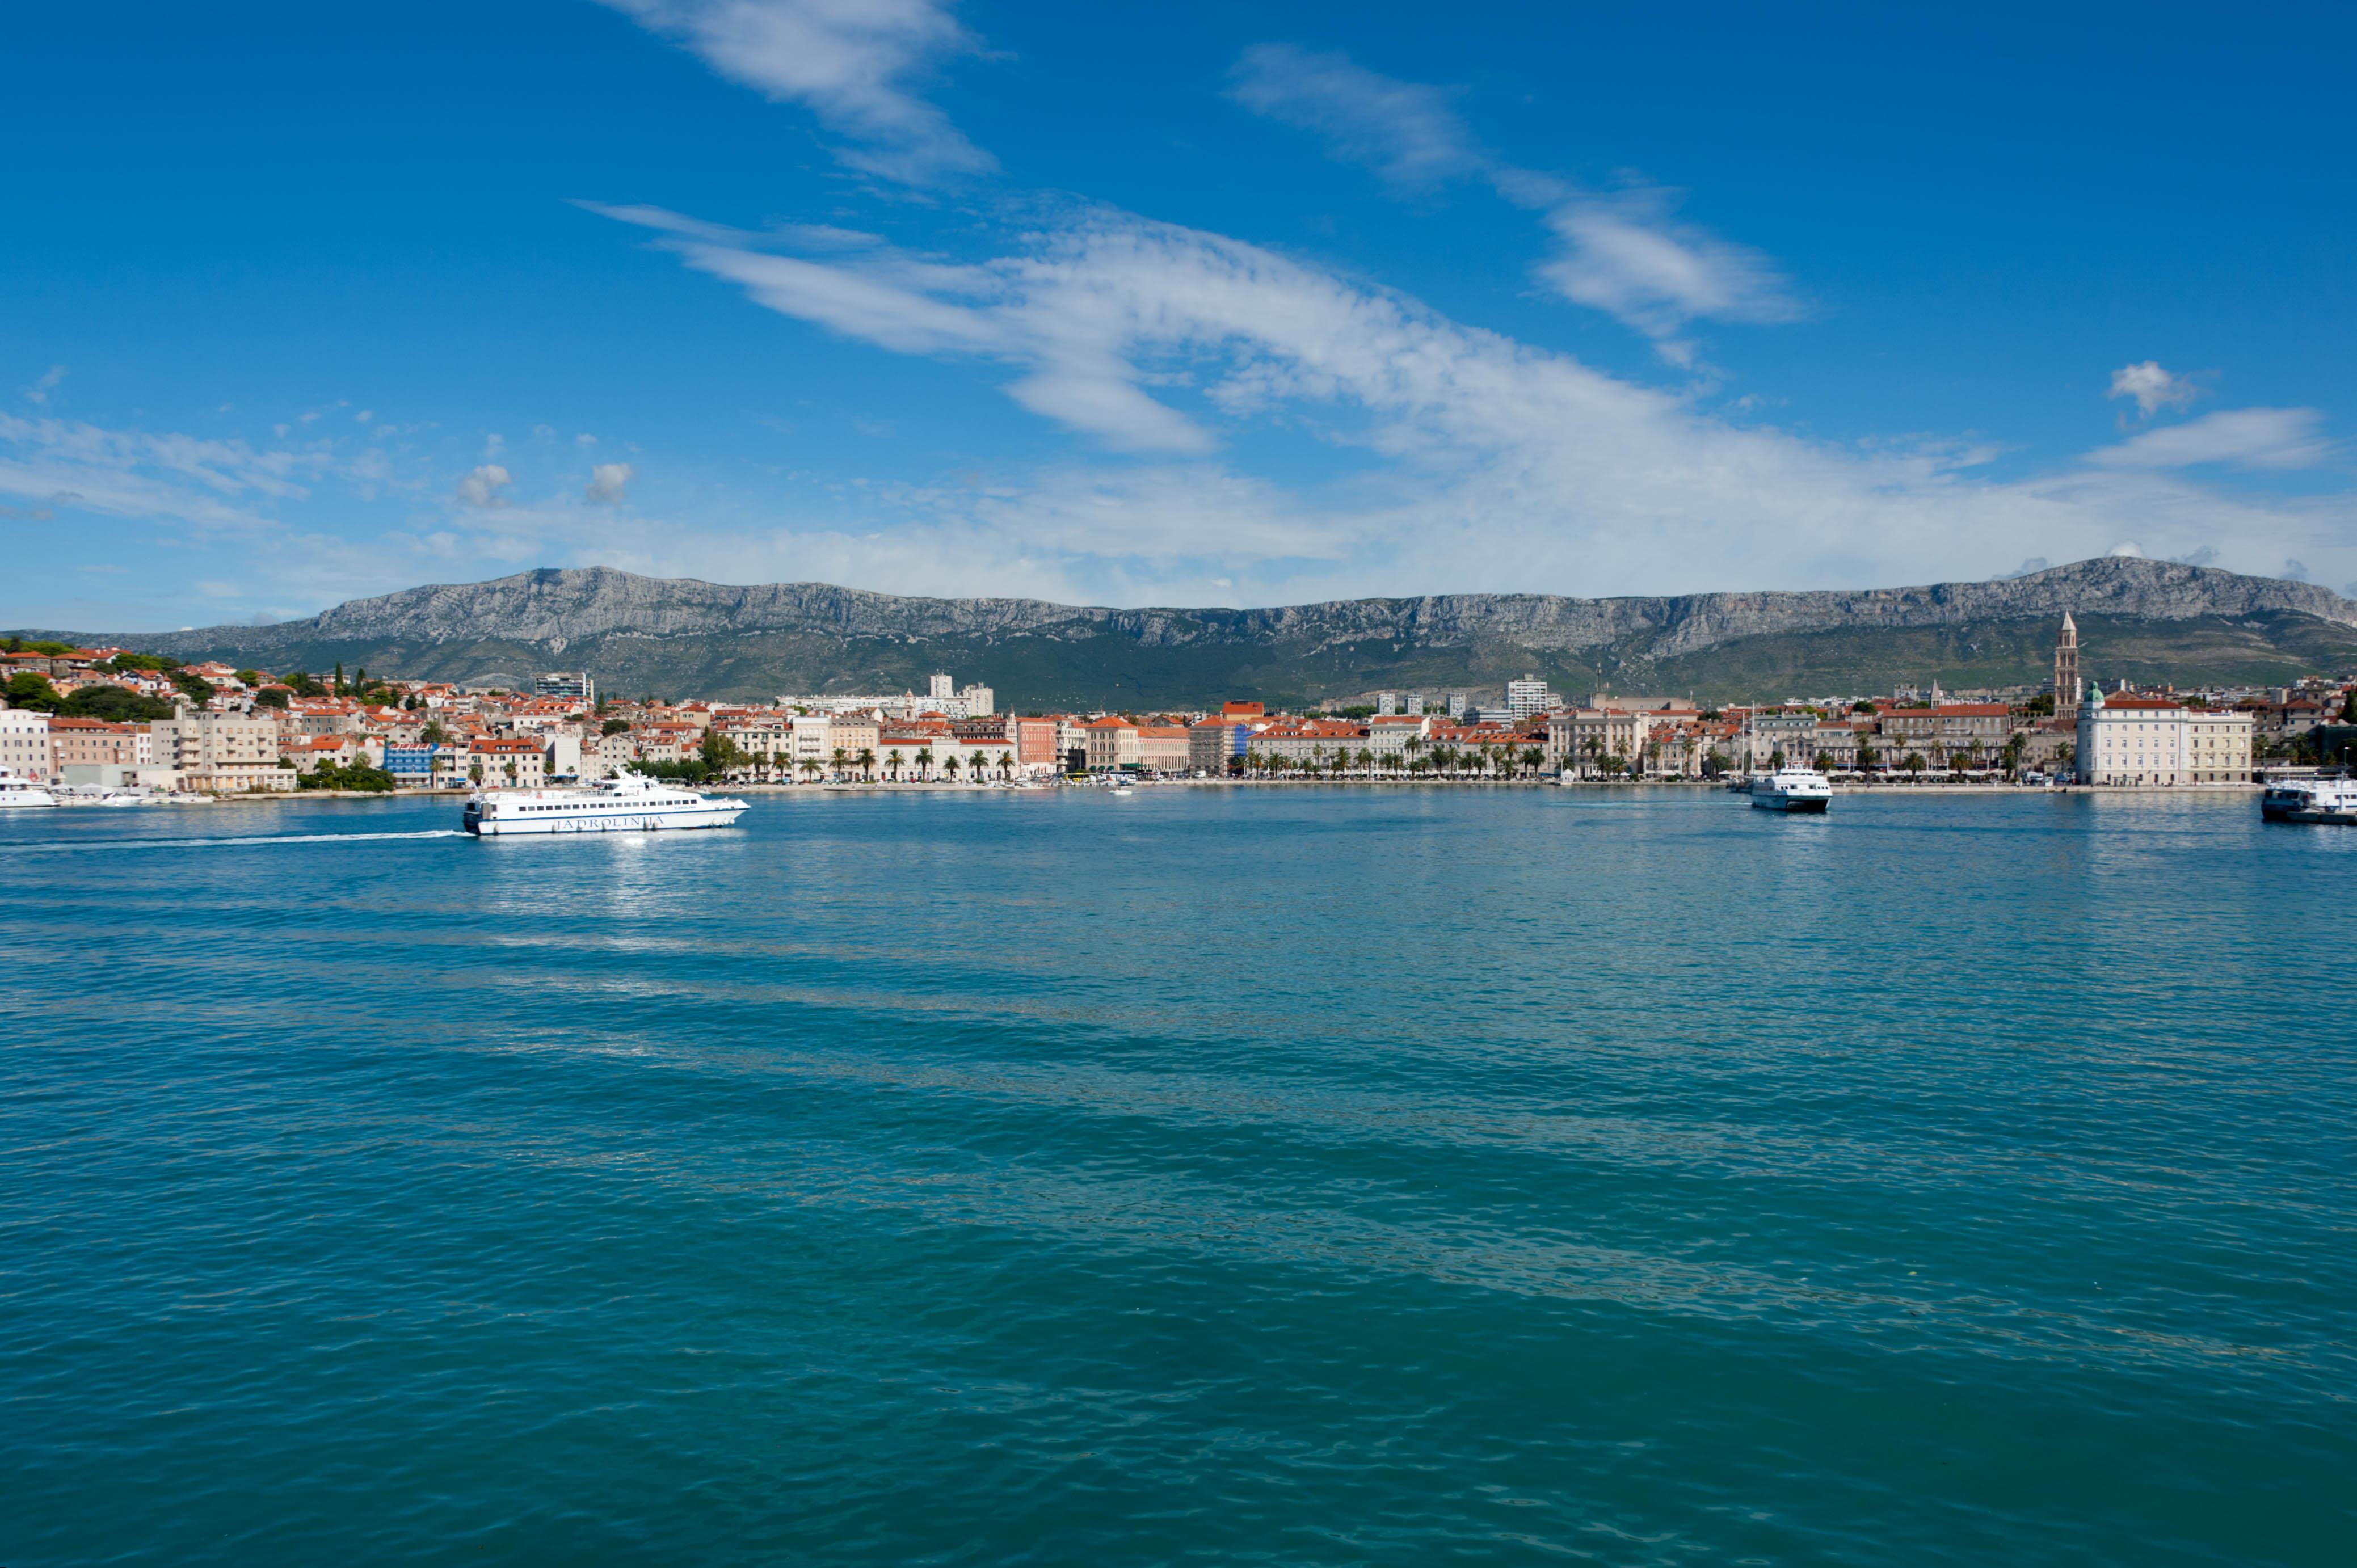 9821-Split (Dalmatie centrale)